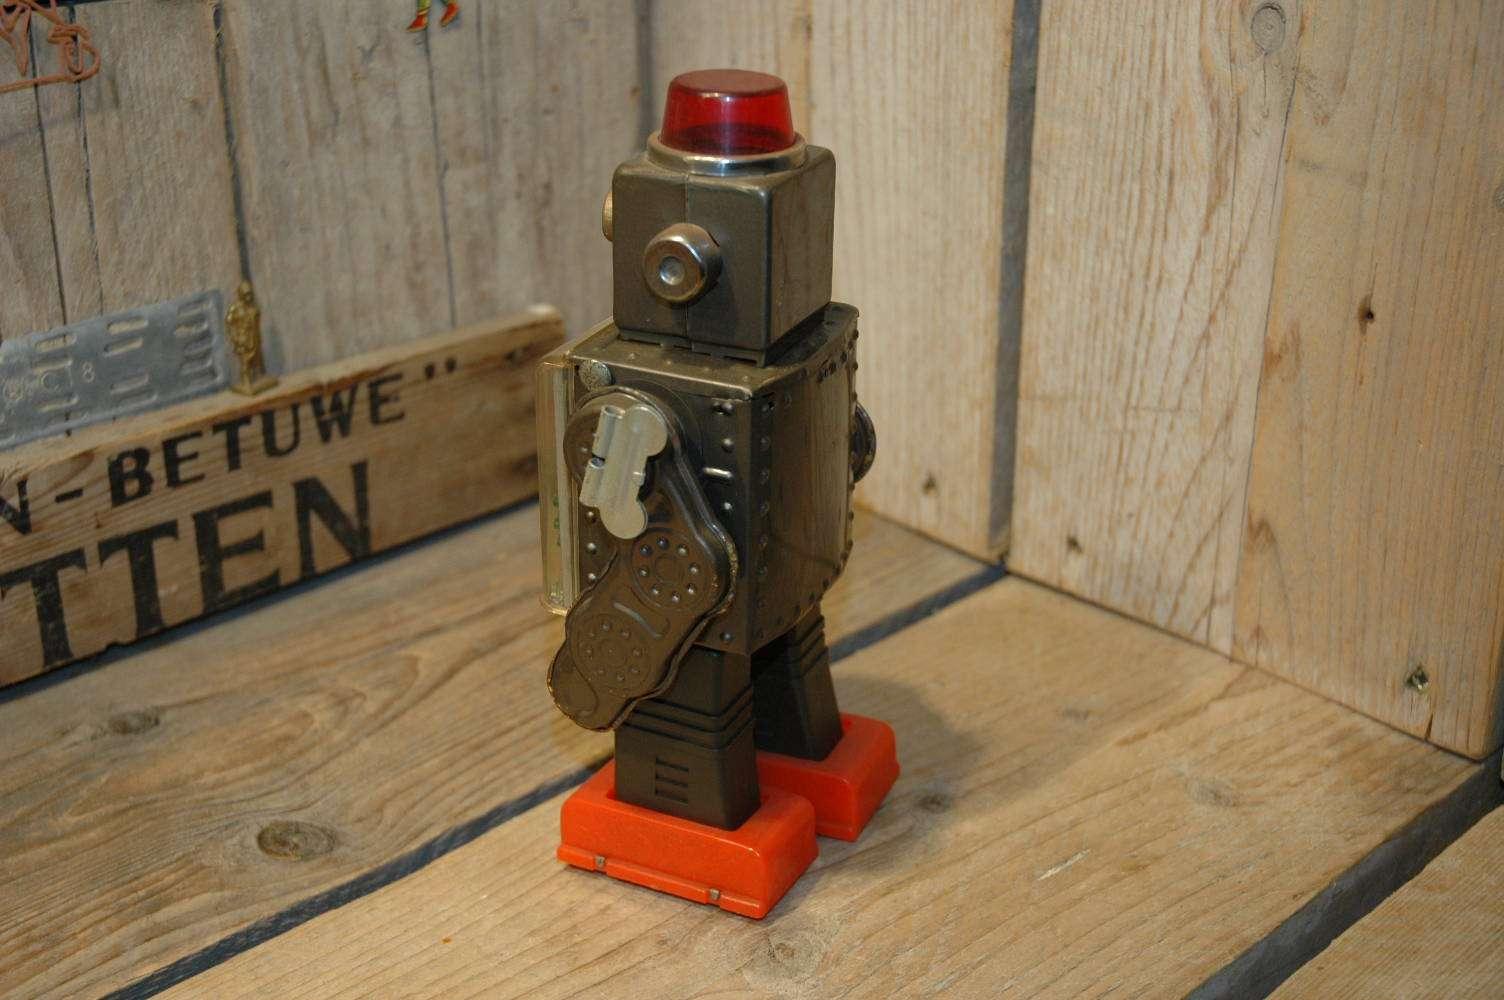 horikawa - Gear Robot with visible gears mechanism